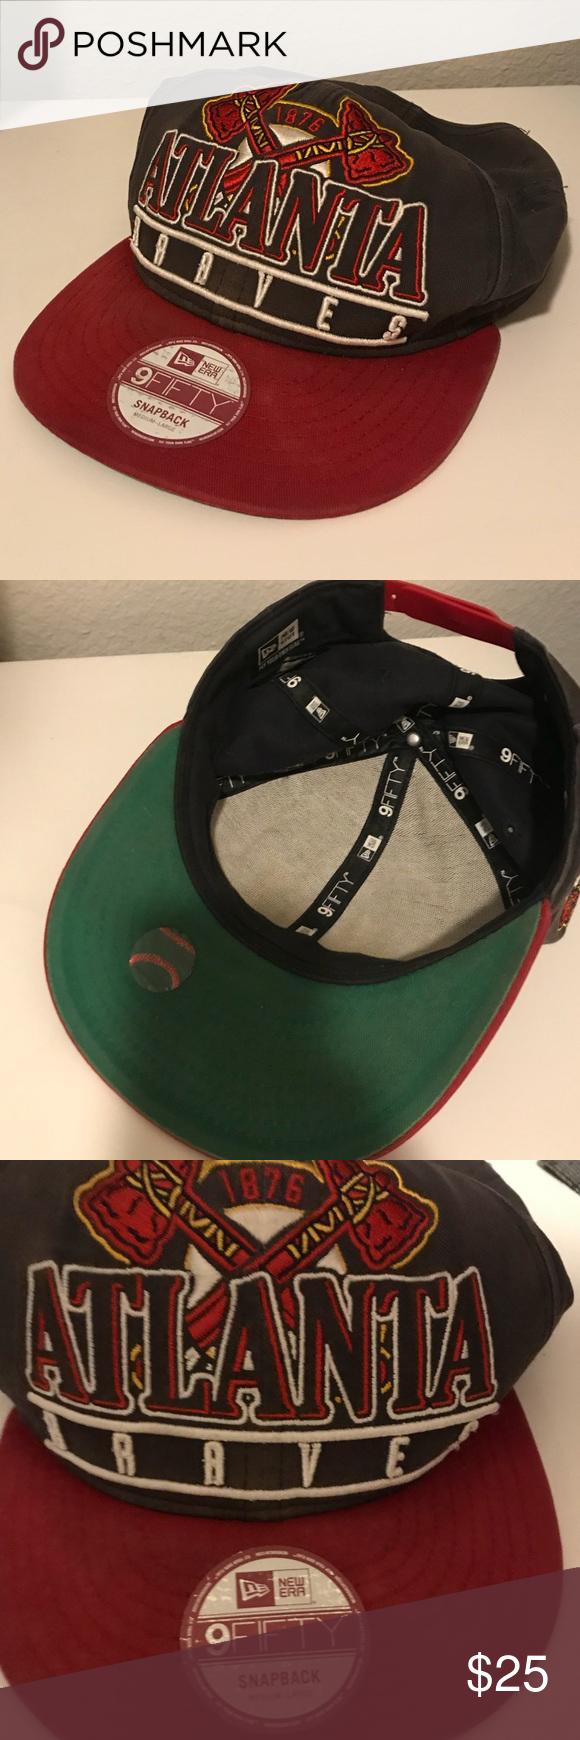 Vintage Atlanta Braves Hat Throwback Vintage Braves Hat Sticker On New Era Accessories Hats Atlanta Braves Hat